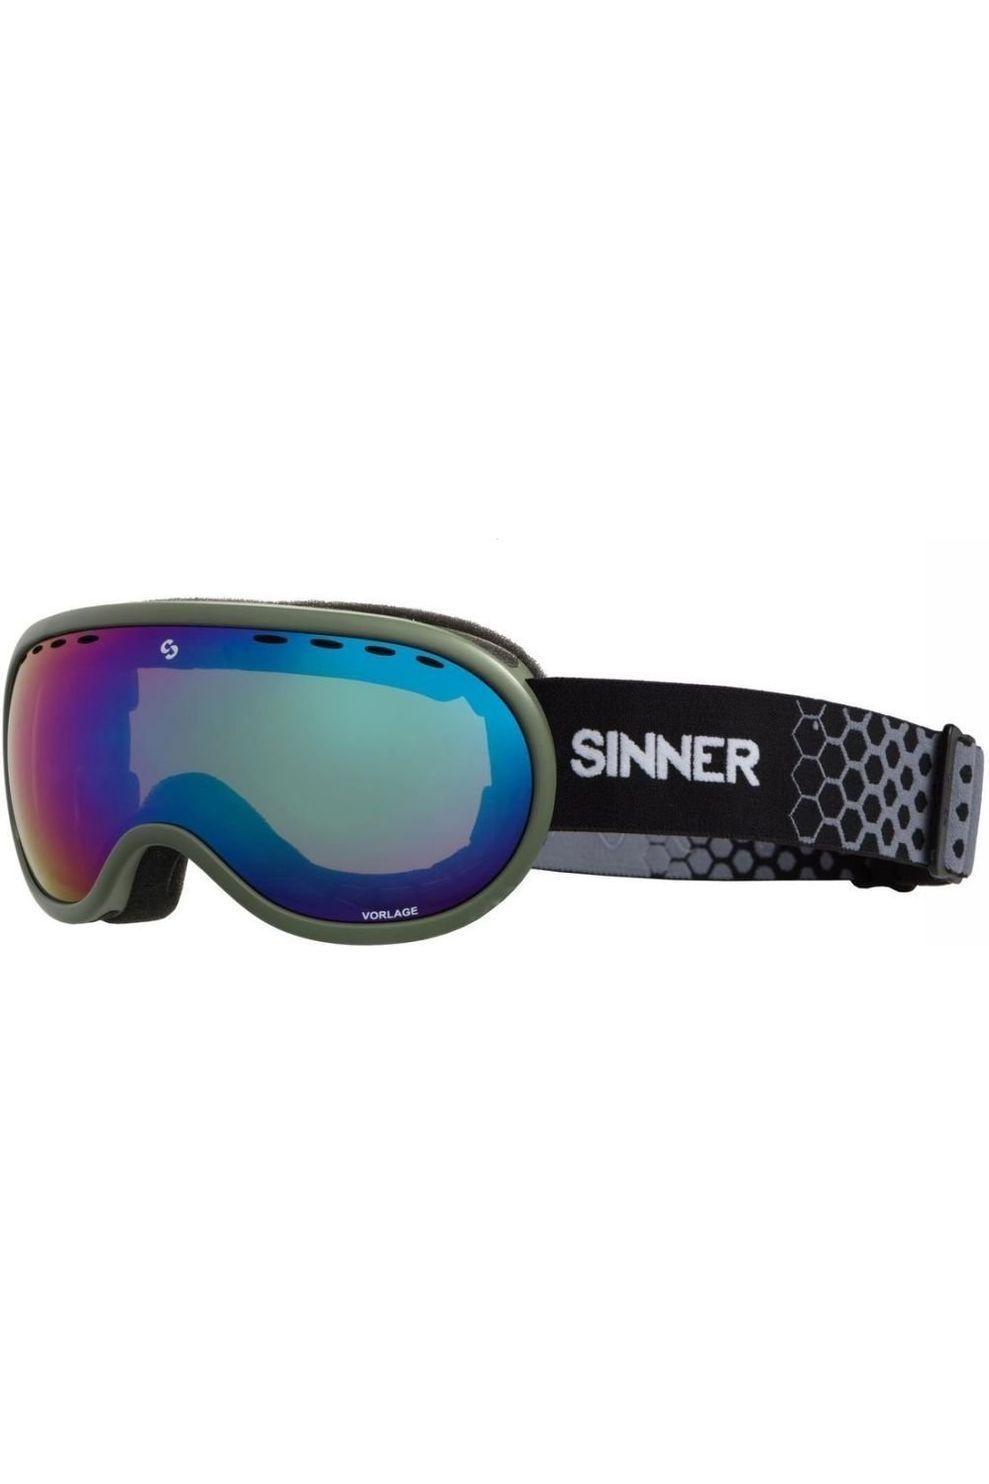 SINNER Skibril Vorlage voor heren - Groen